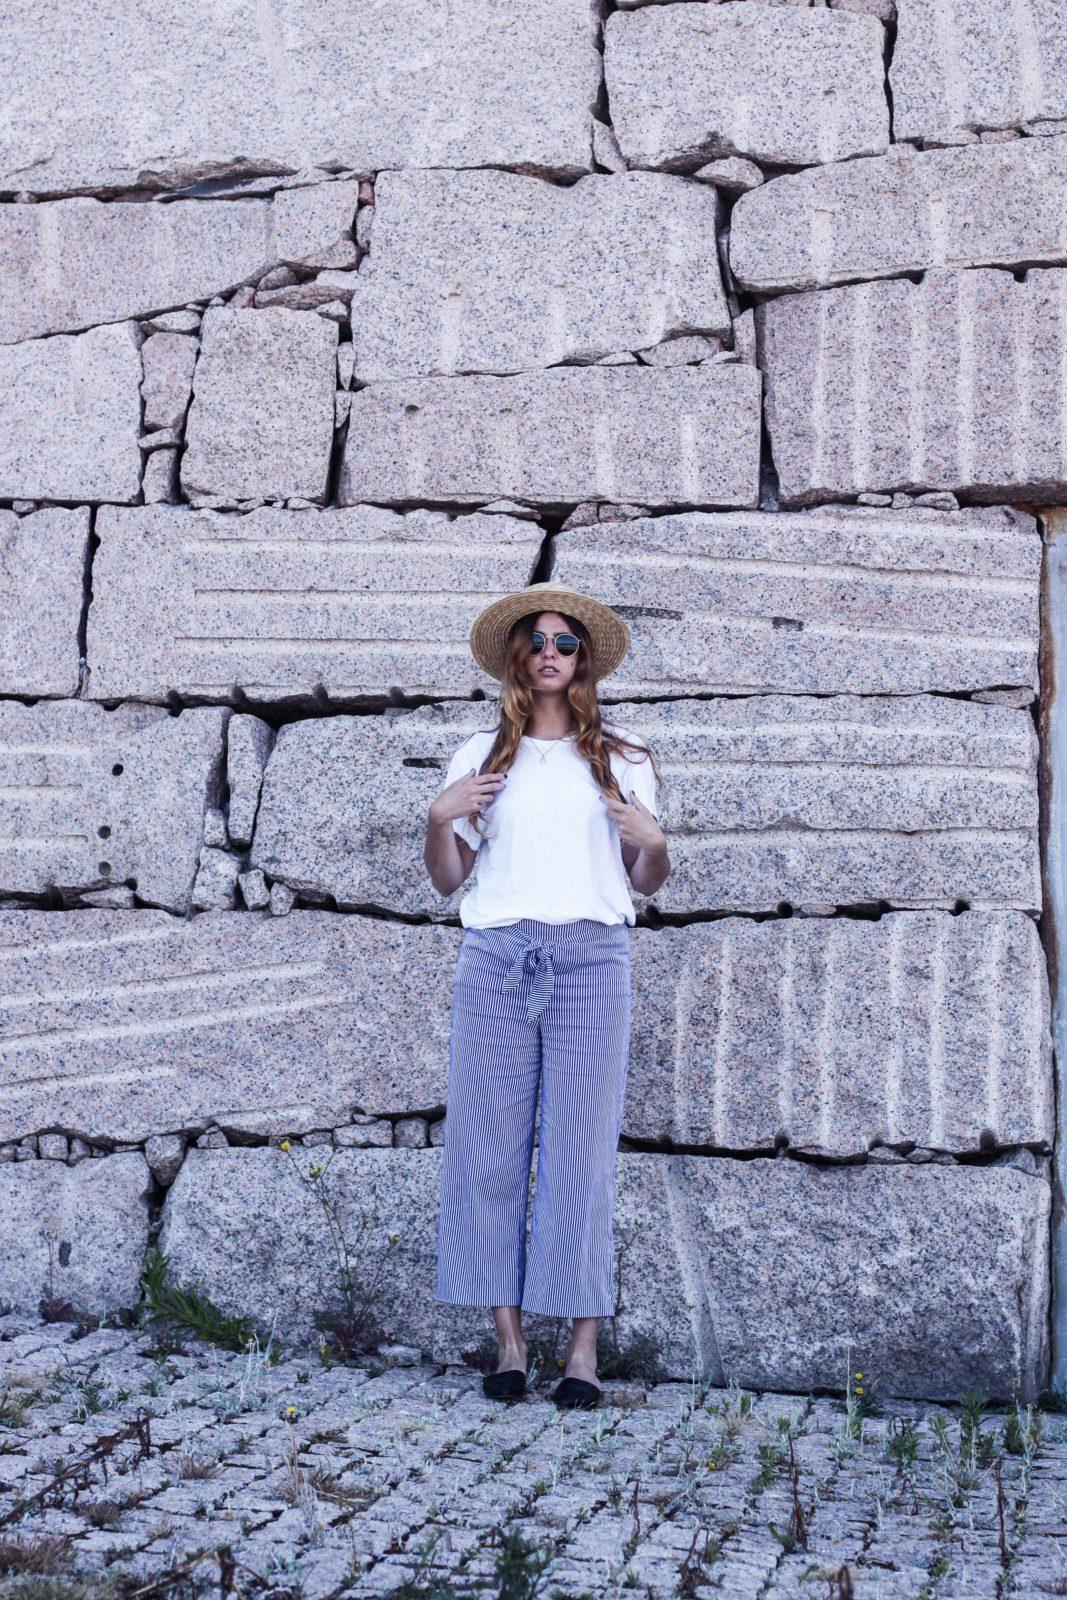 pantalones_con_lazo_colgante_herradura_donkeycool_ardentia_canotier-32